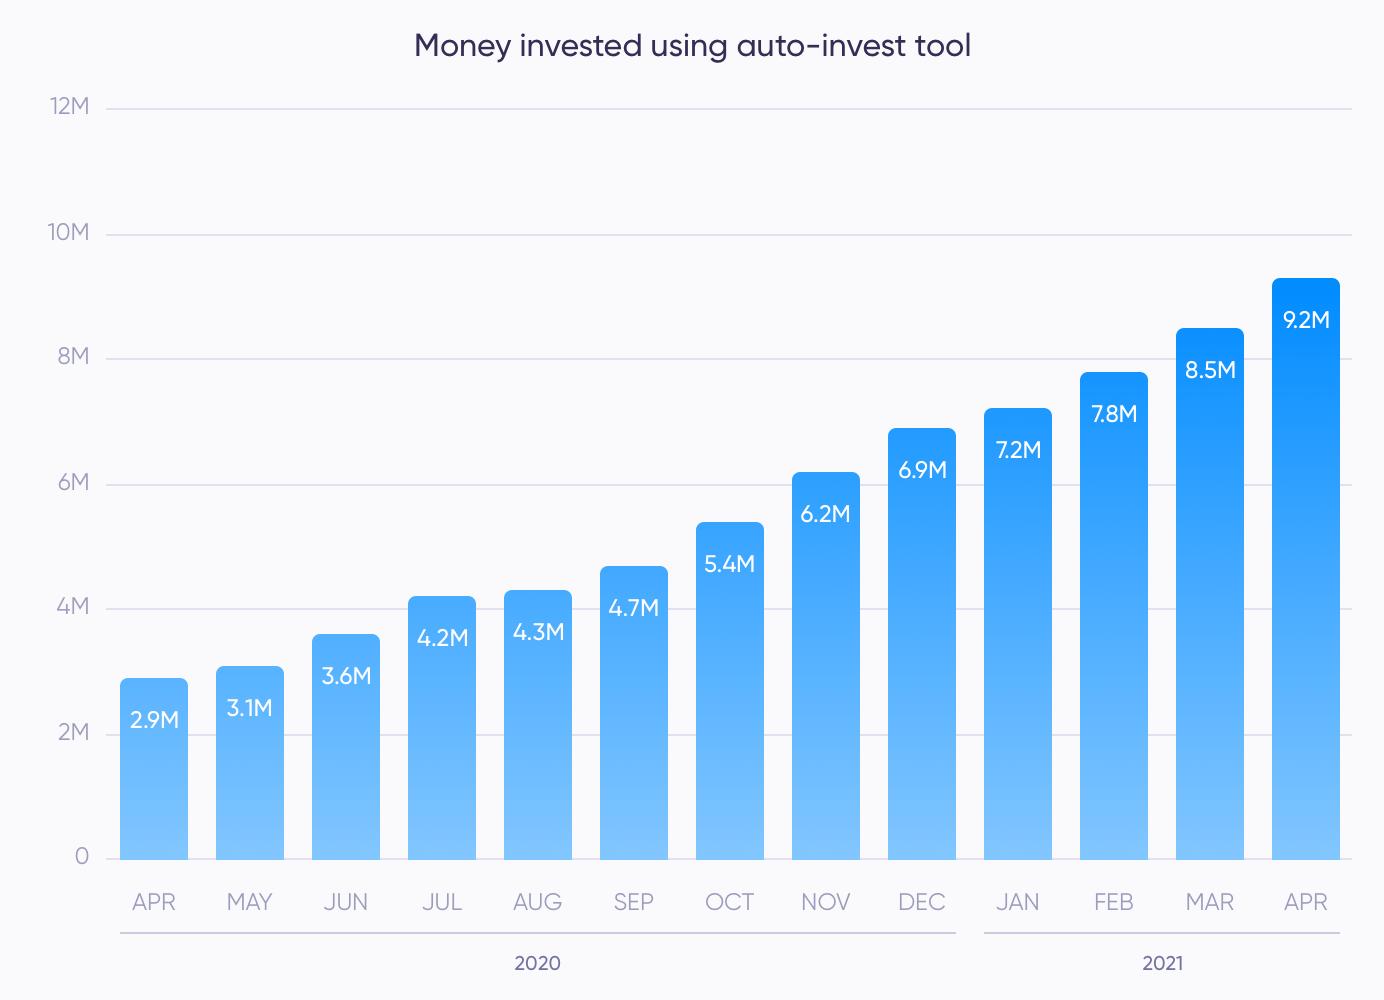 Auto invests (April)